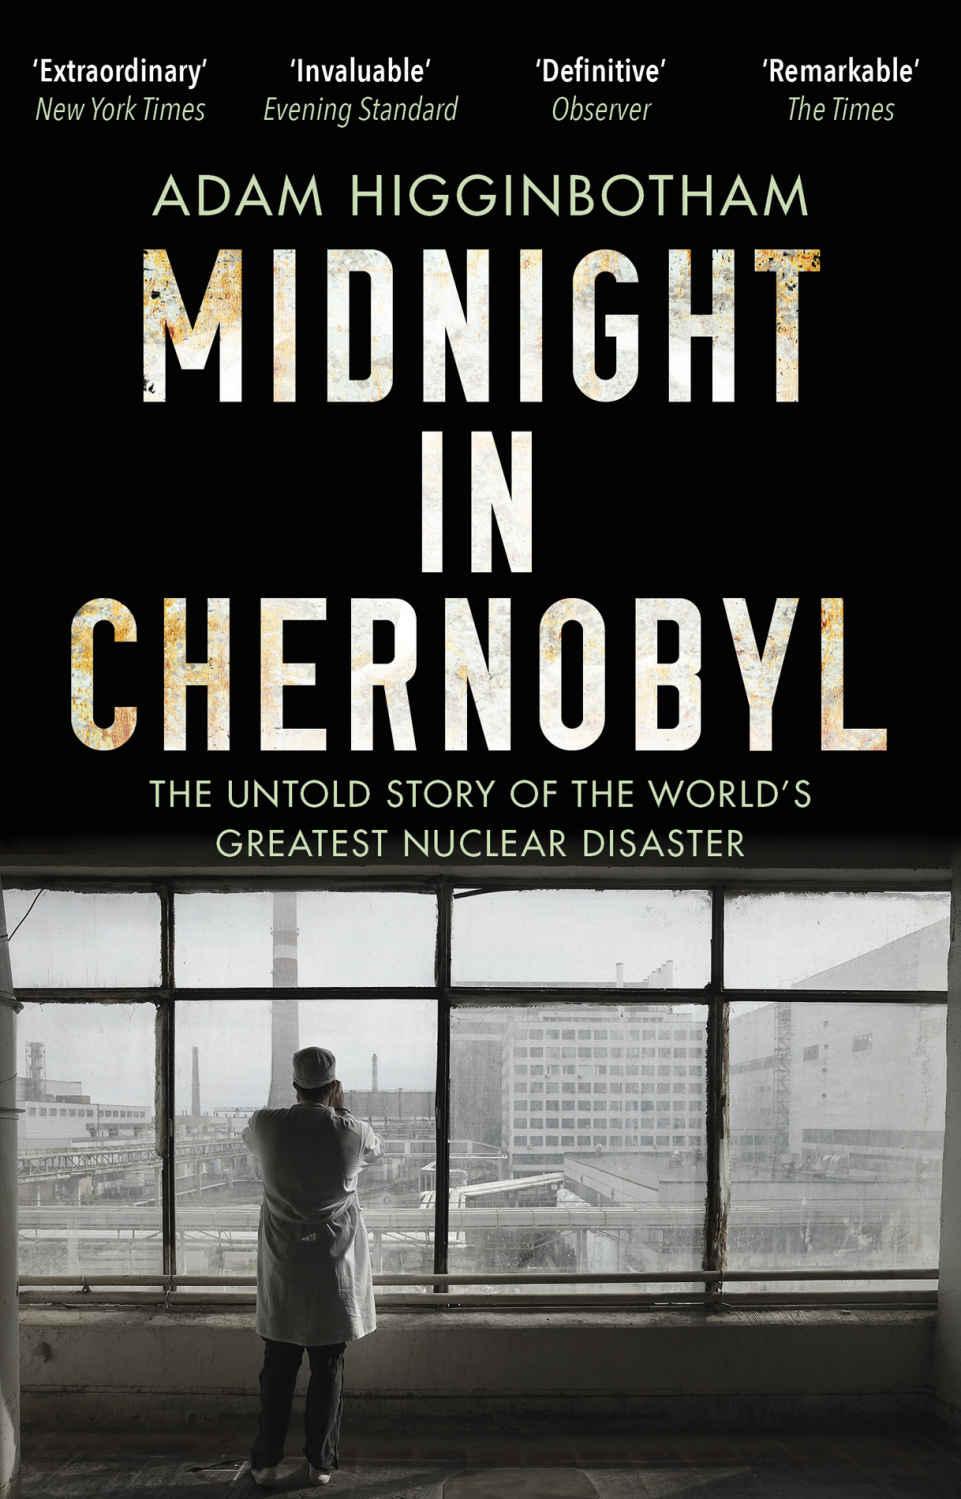 Midnight in Chernobyl: Adam Higginbotham Kindle Edition 99p Amazon